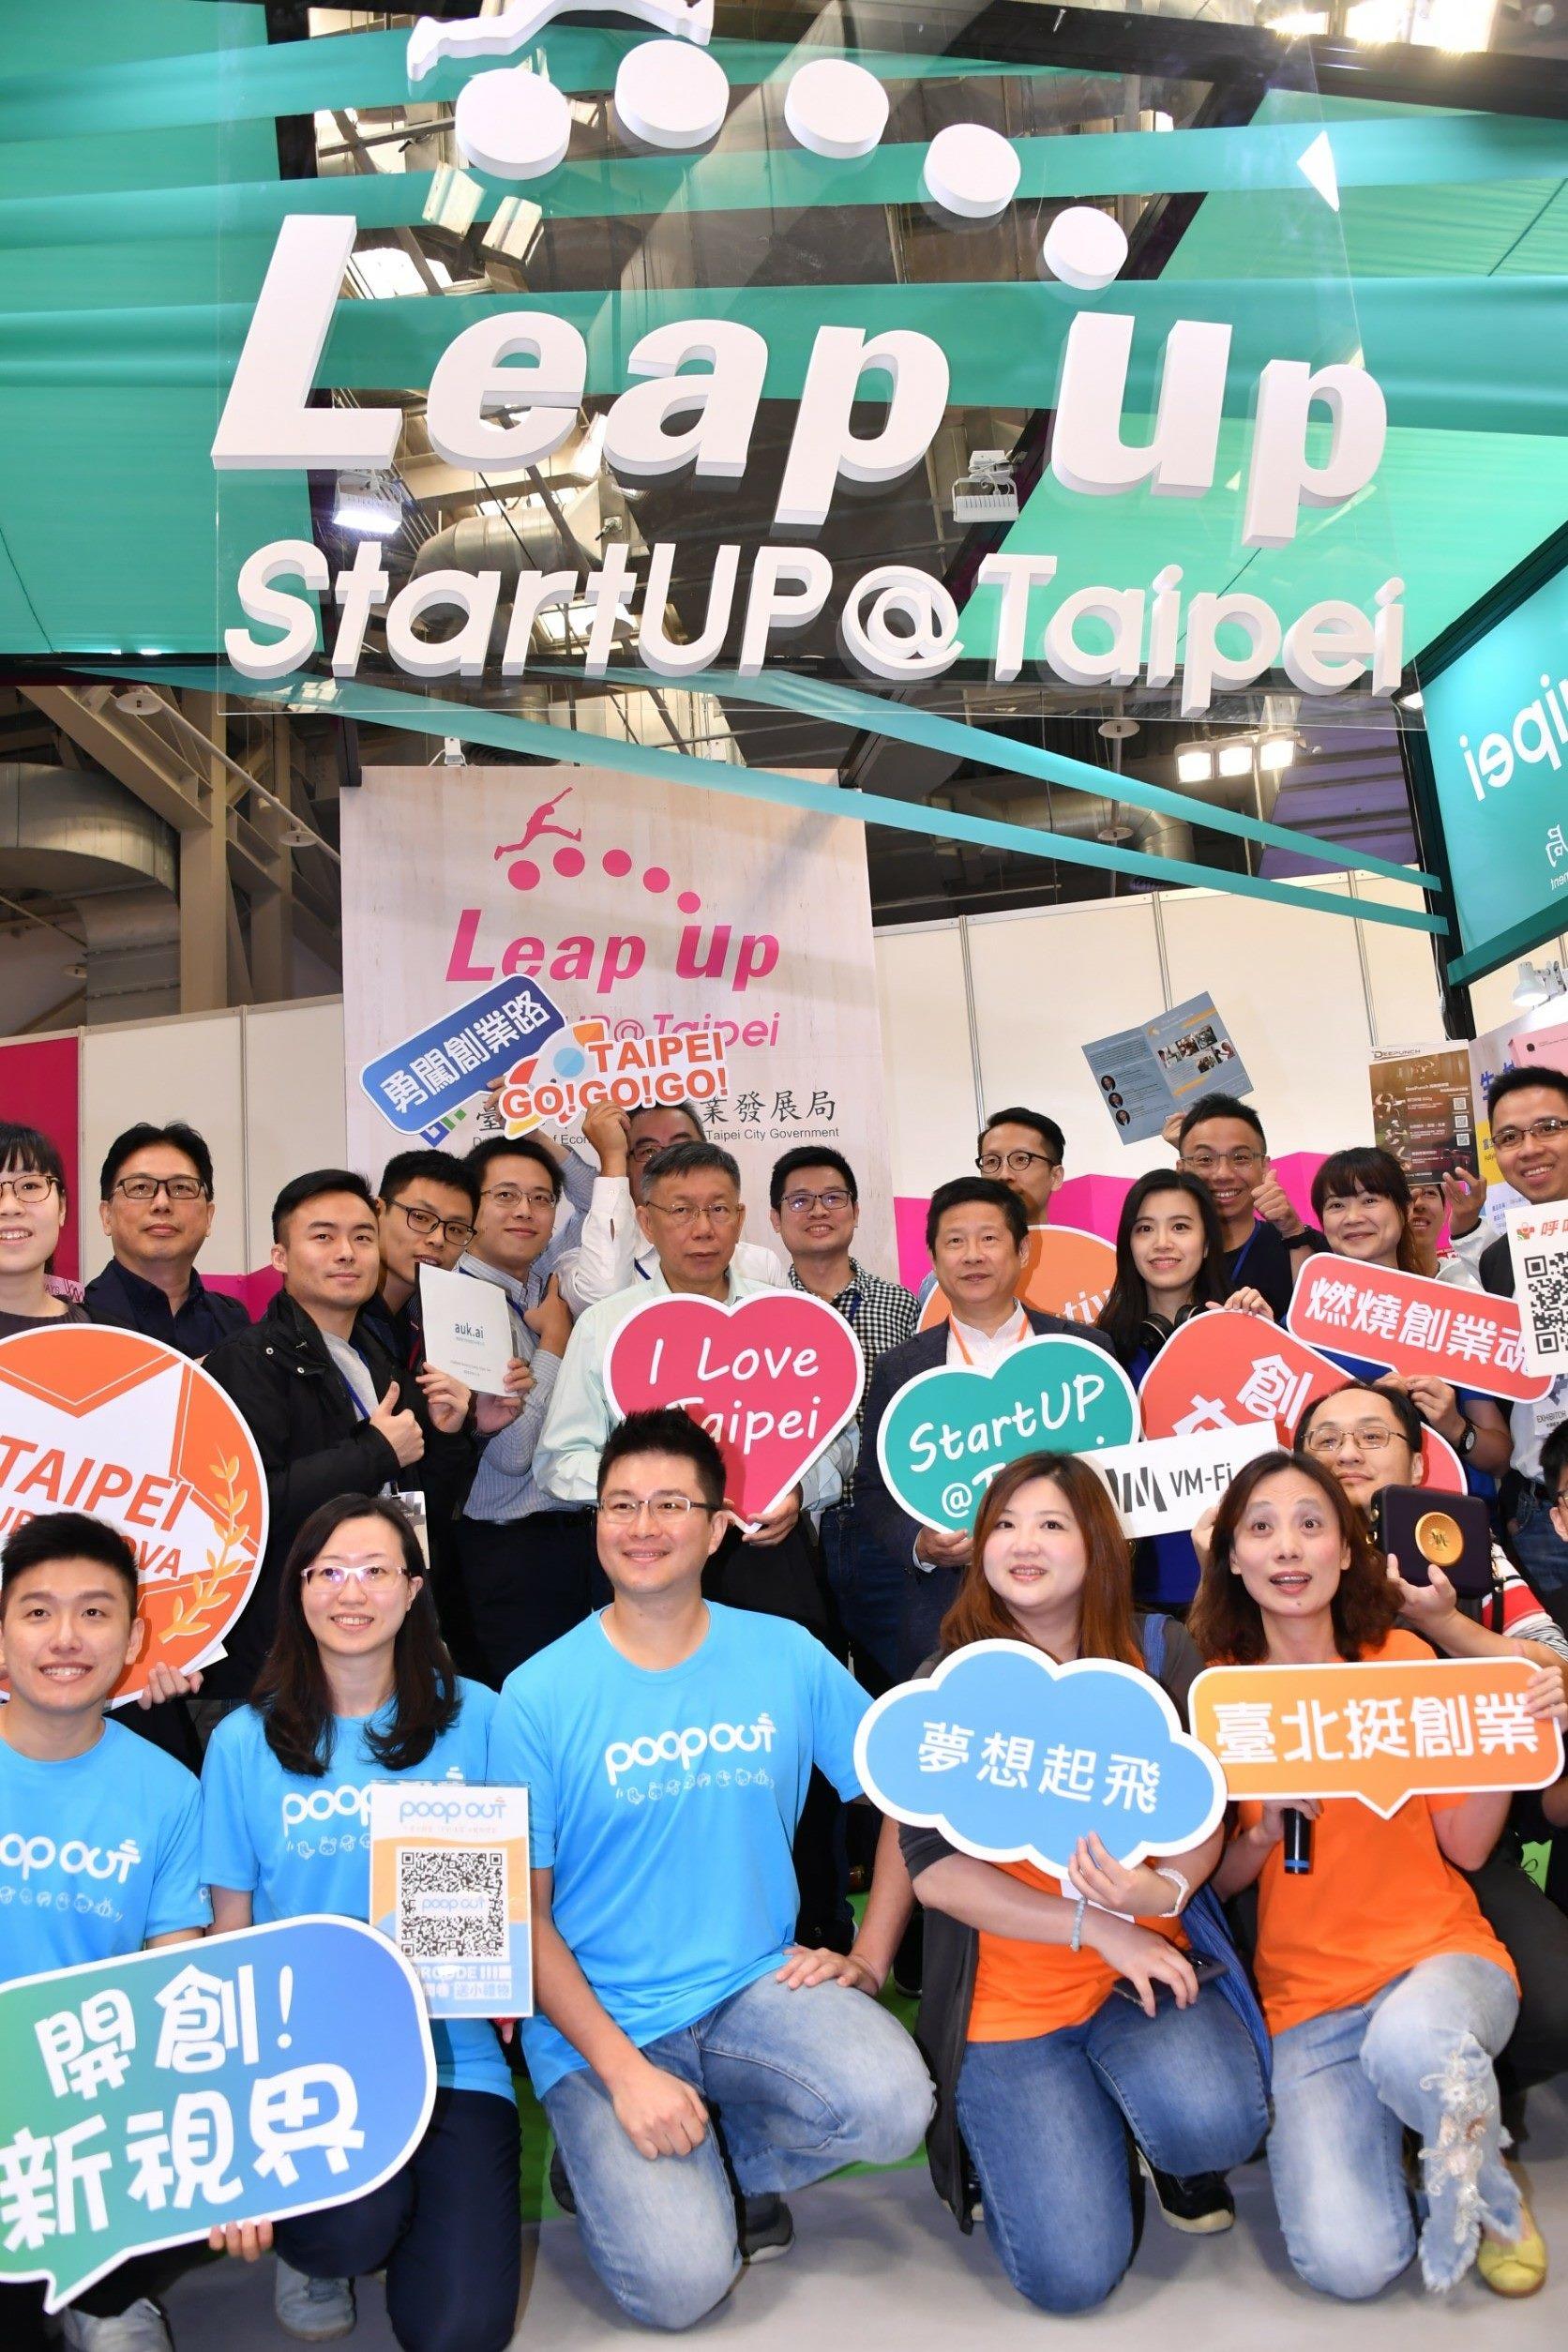 Mayor Ko at the Meet Taipei Startup event